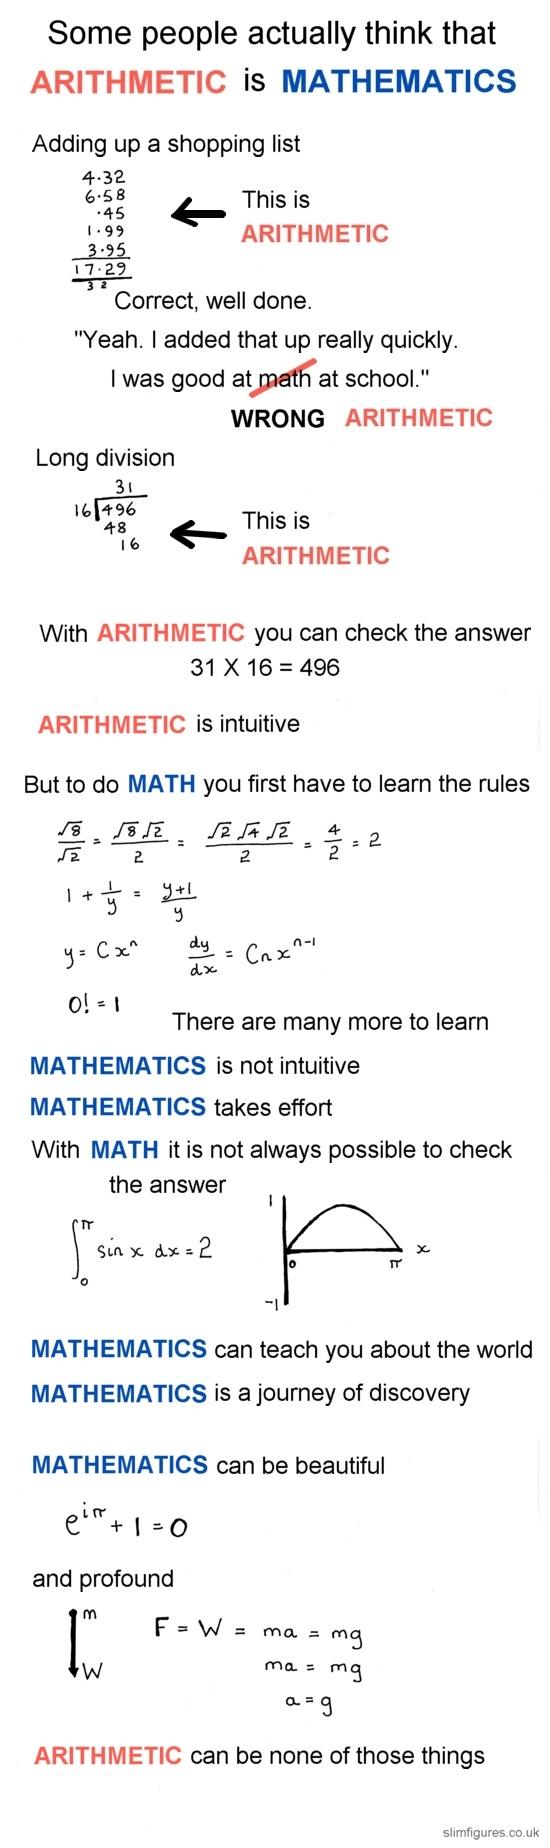 slim figures math comic